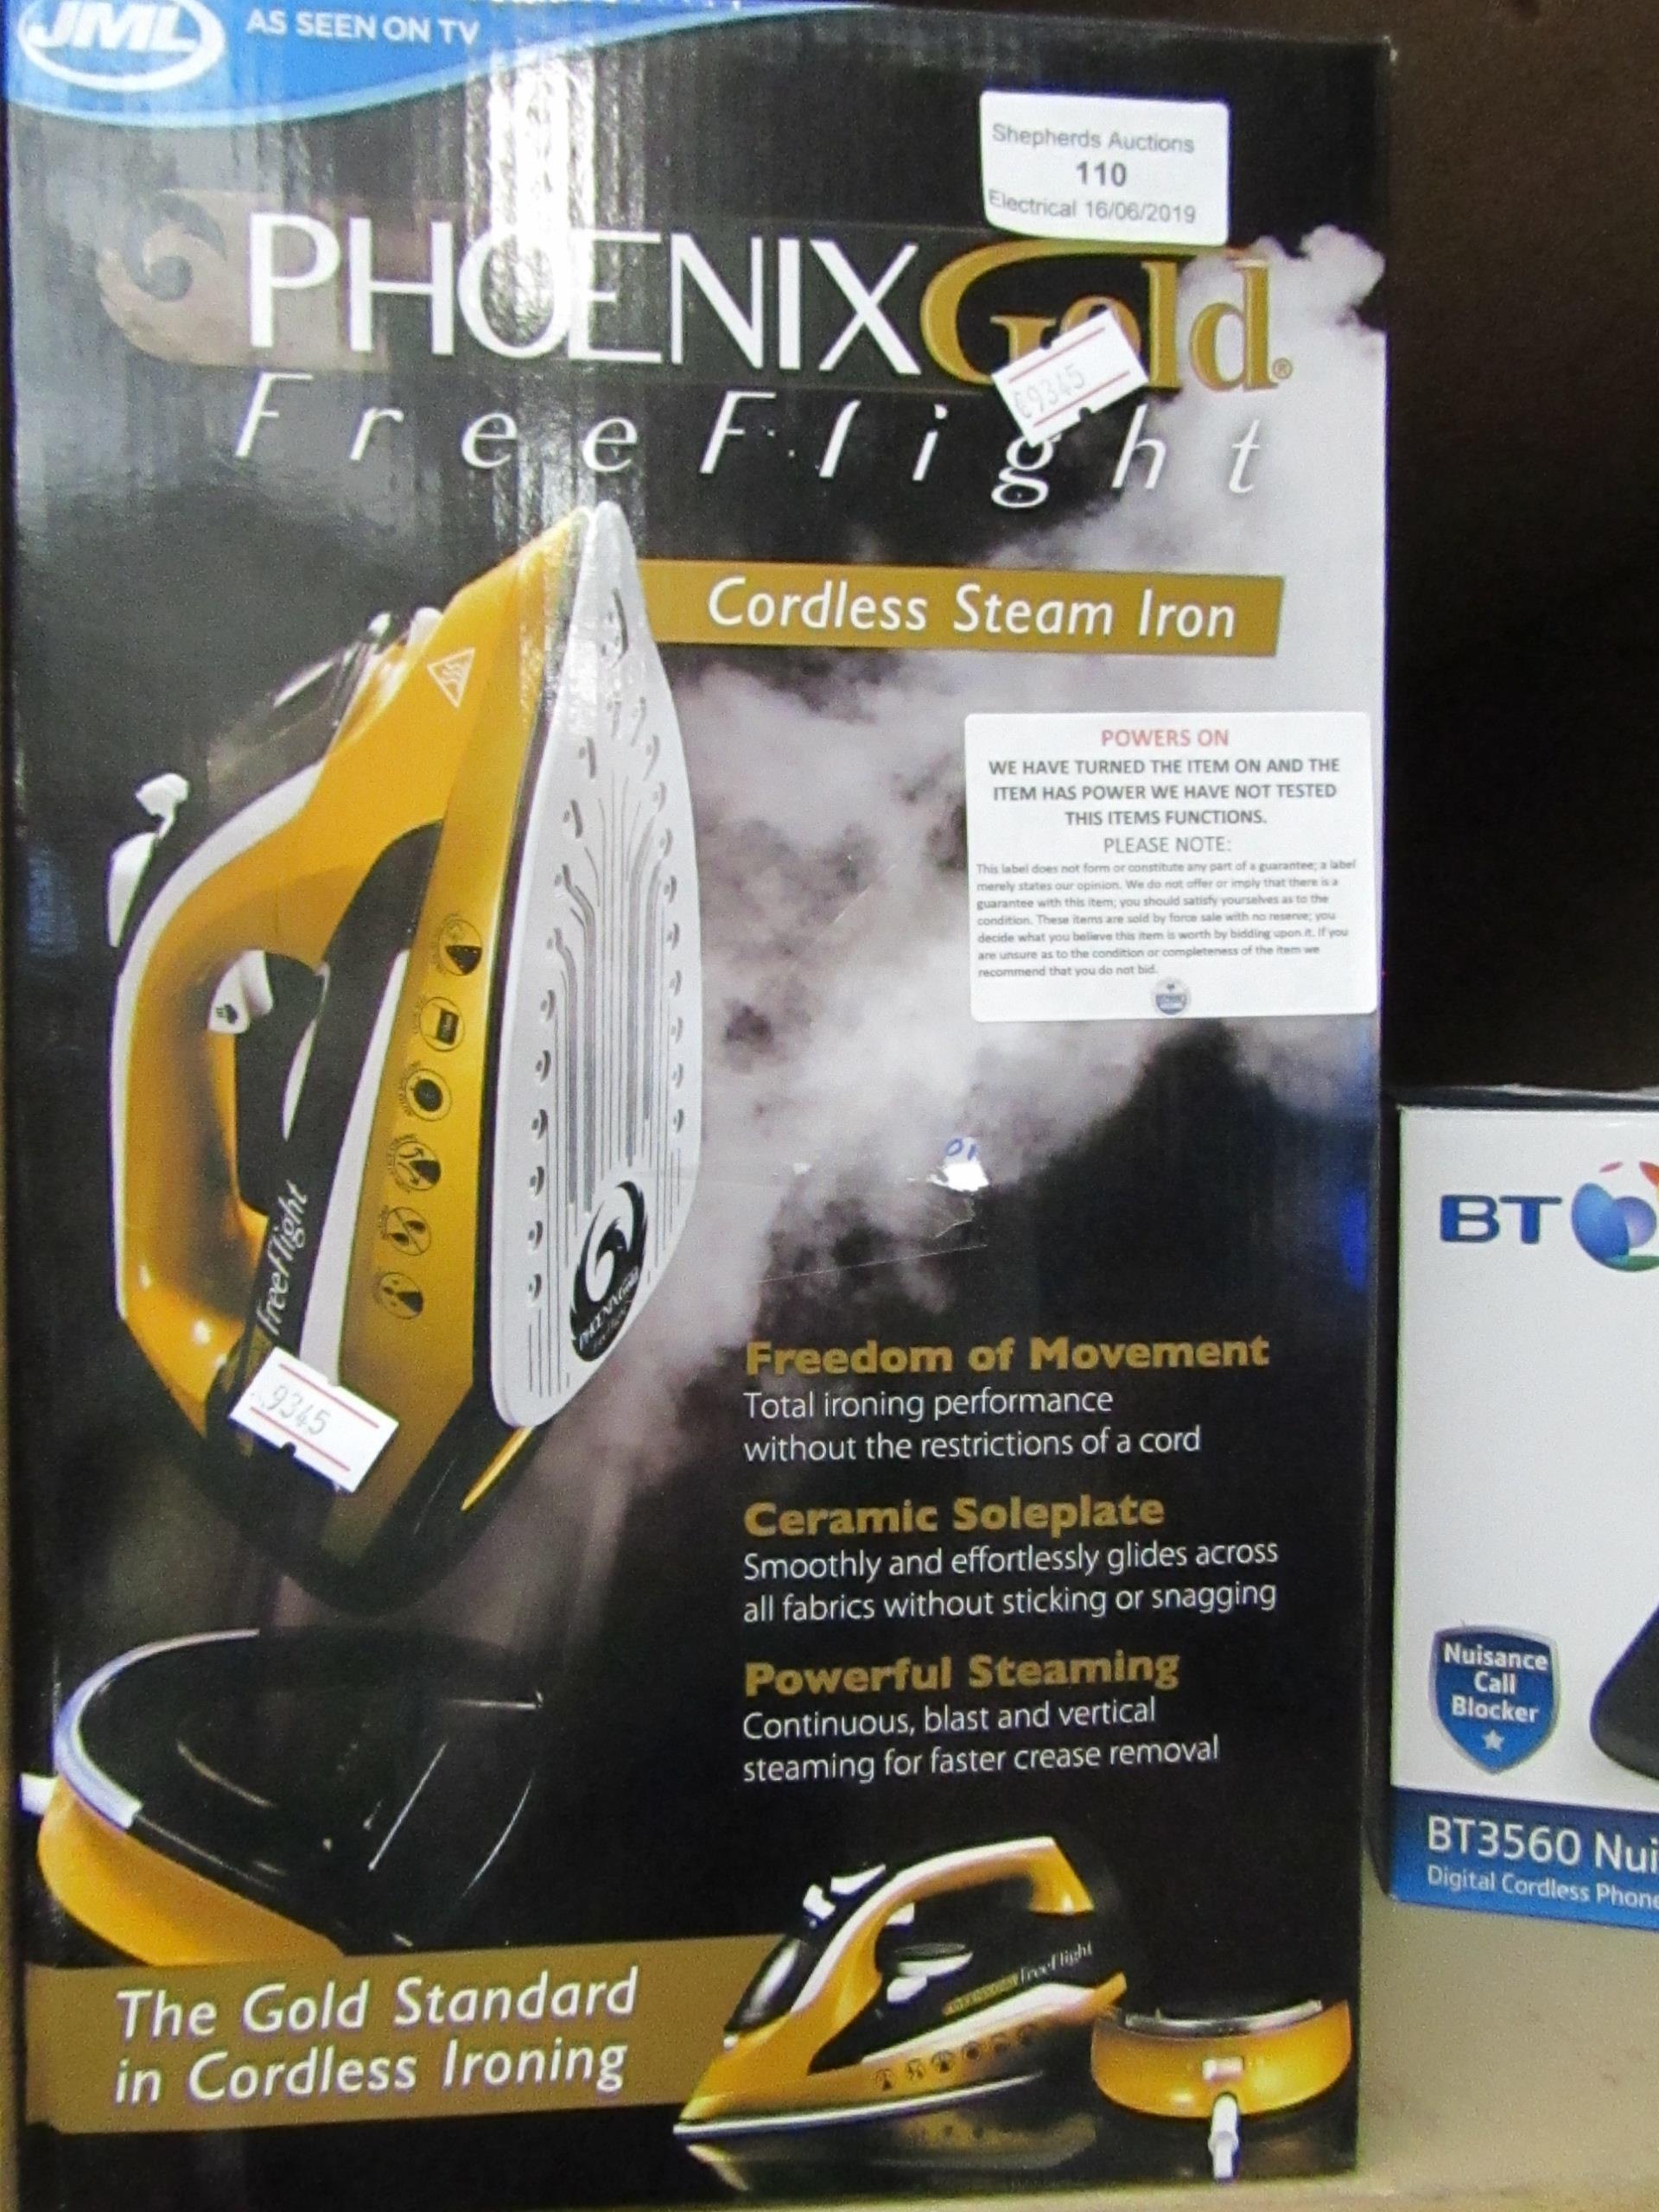 Lot 110 - JML Phoenix Gold Free Flight cordless steam iron, powers on and boxed.